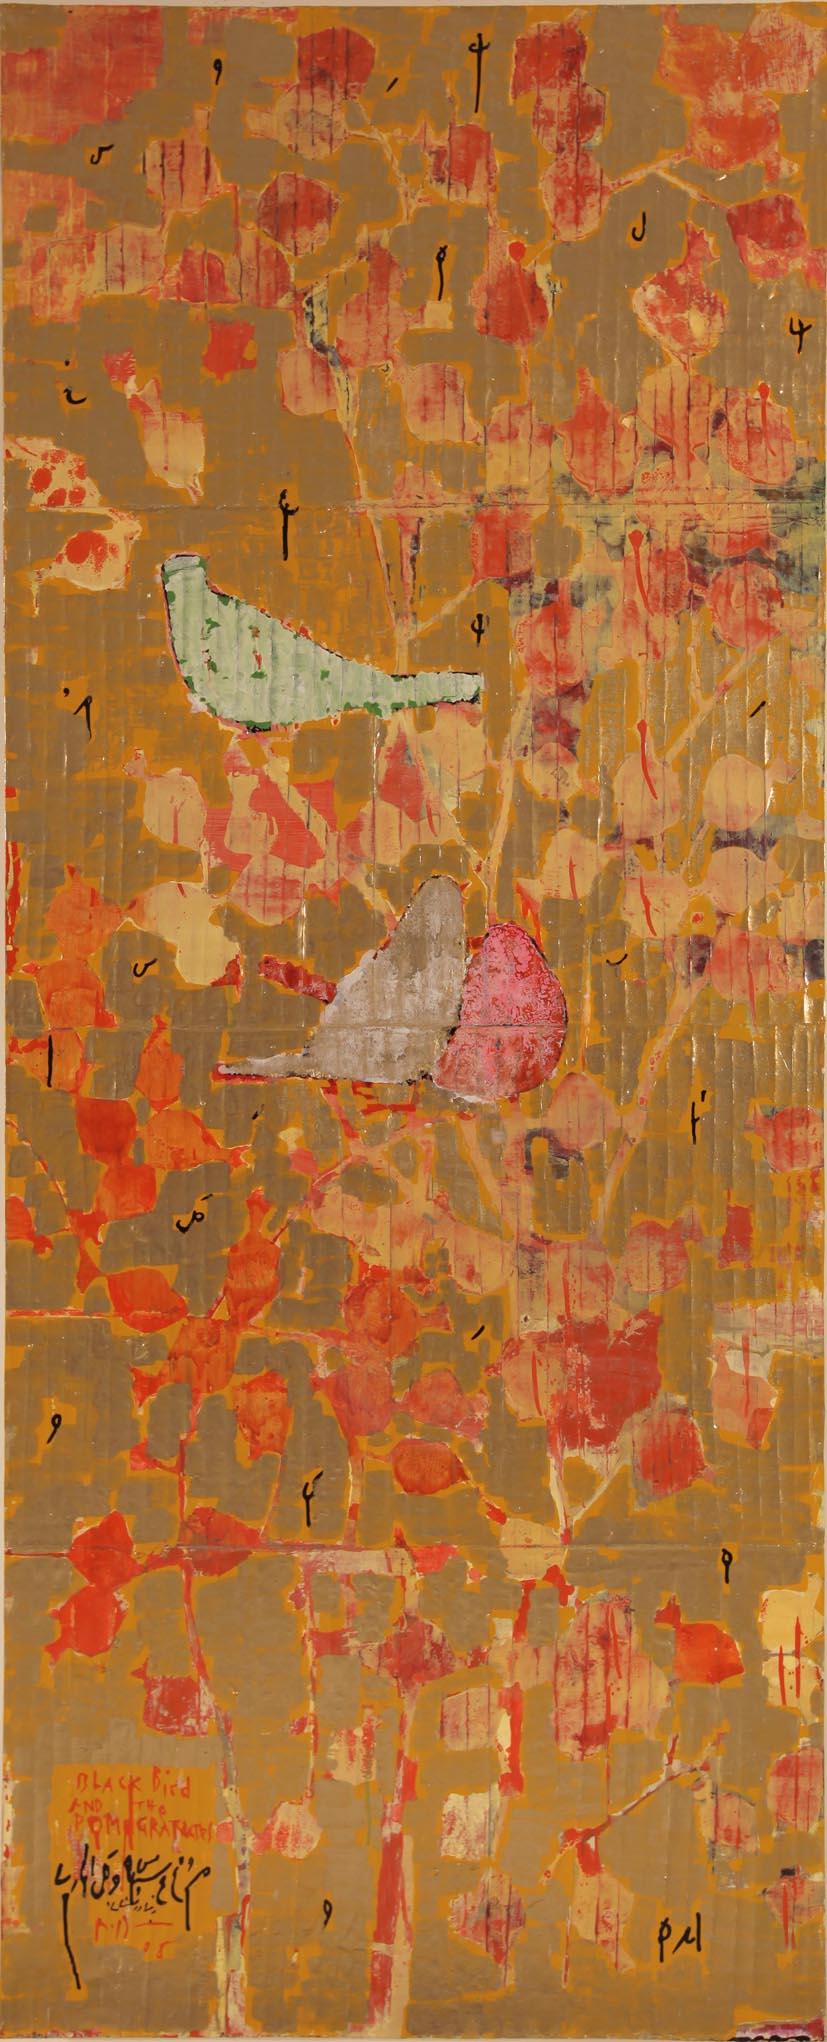 Reza Derakshani - Flower and Bird Series, Mixed Media on Canvas 220x90cm, 2009, 30000dollars.JPG